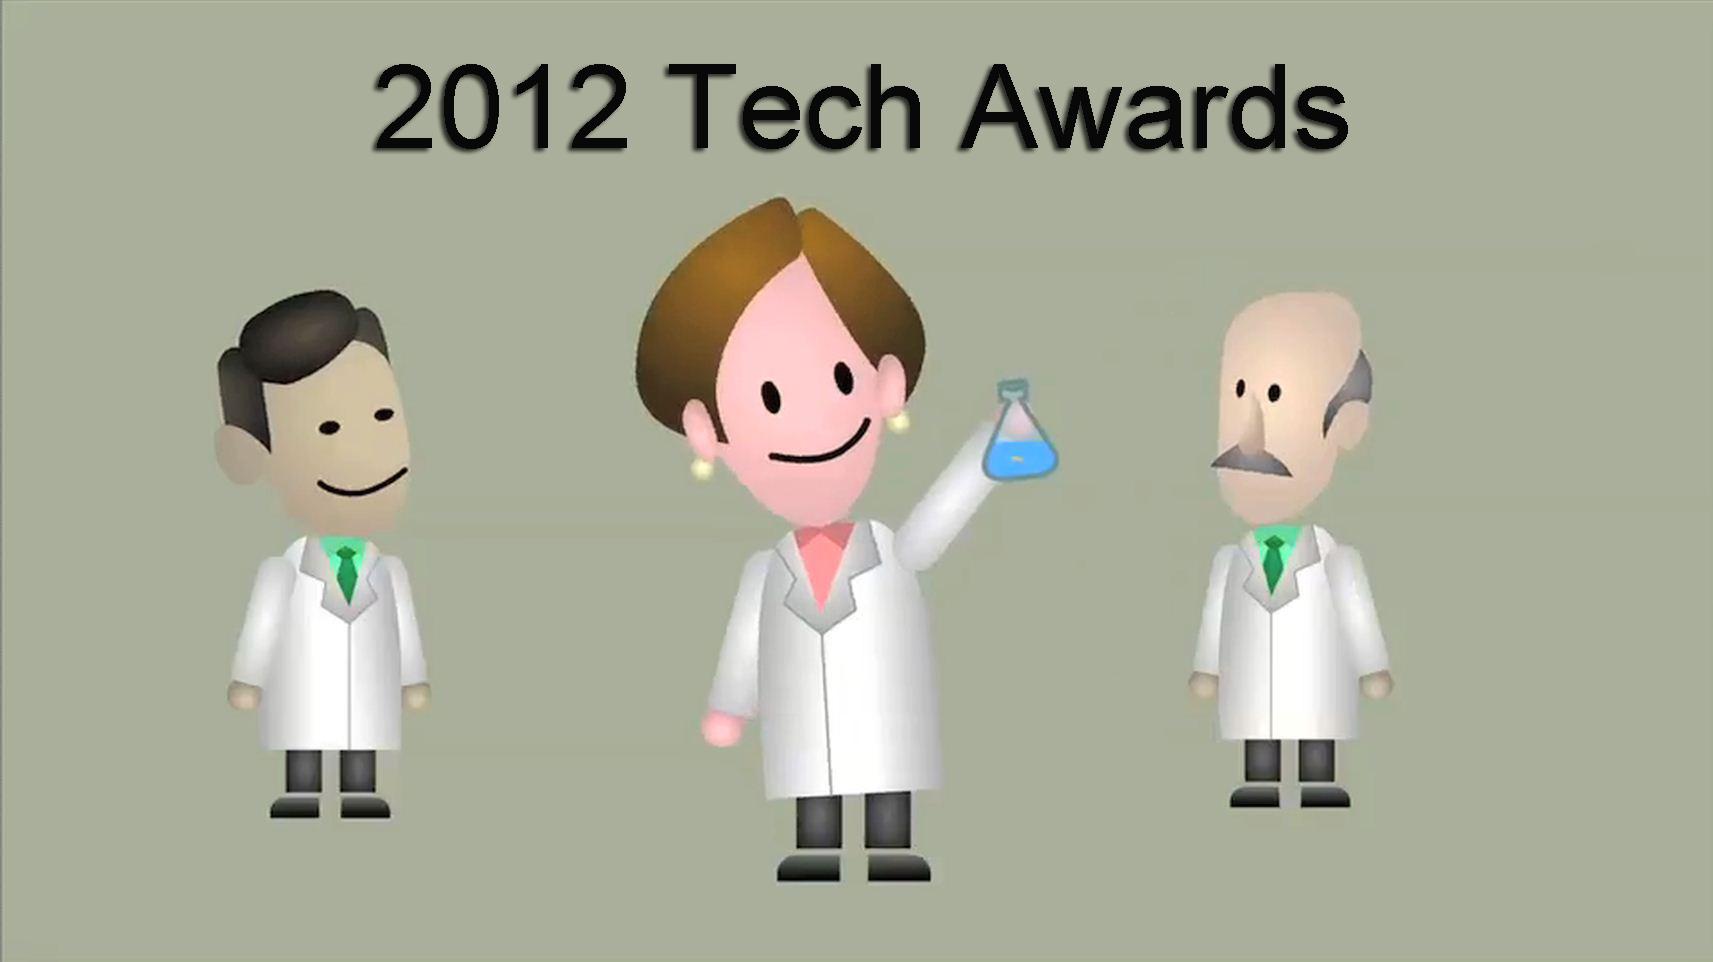 2012 Tech Awards